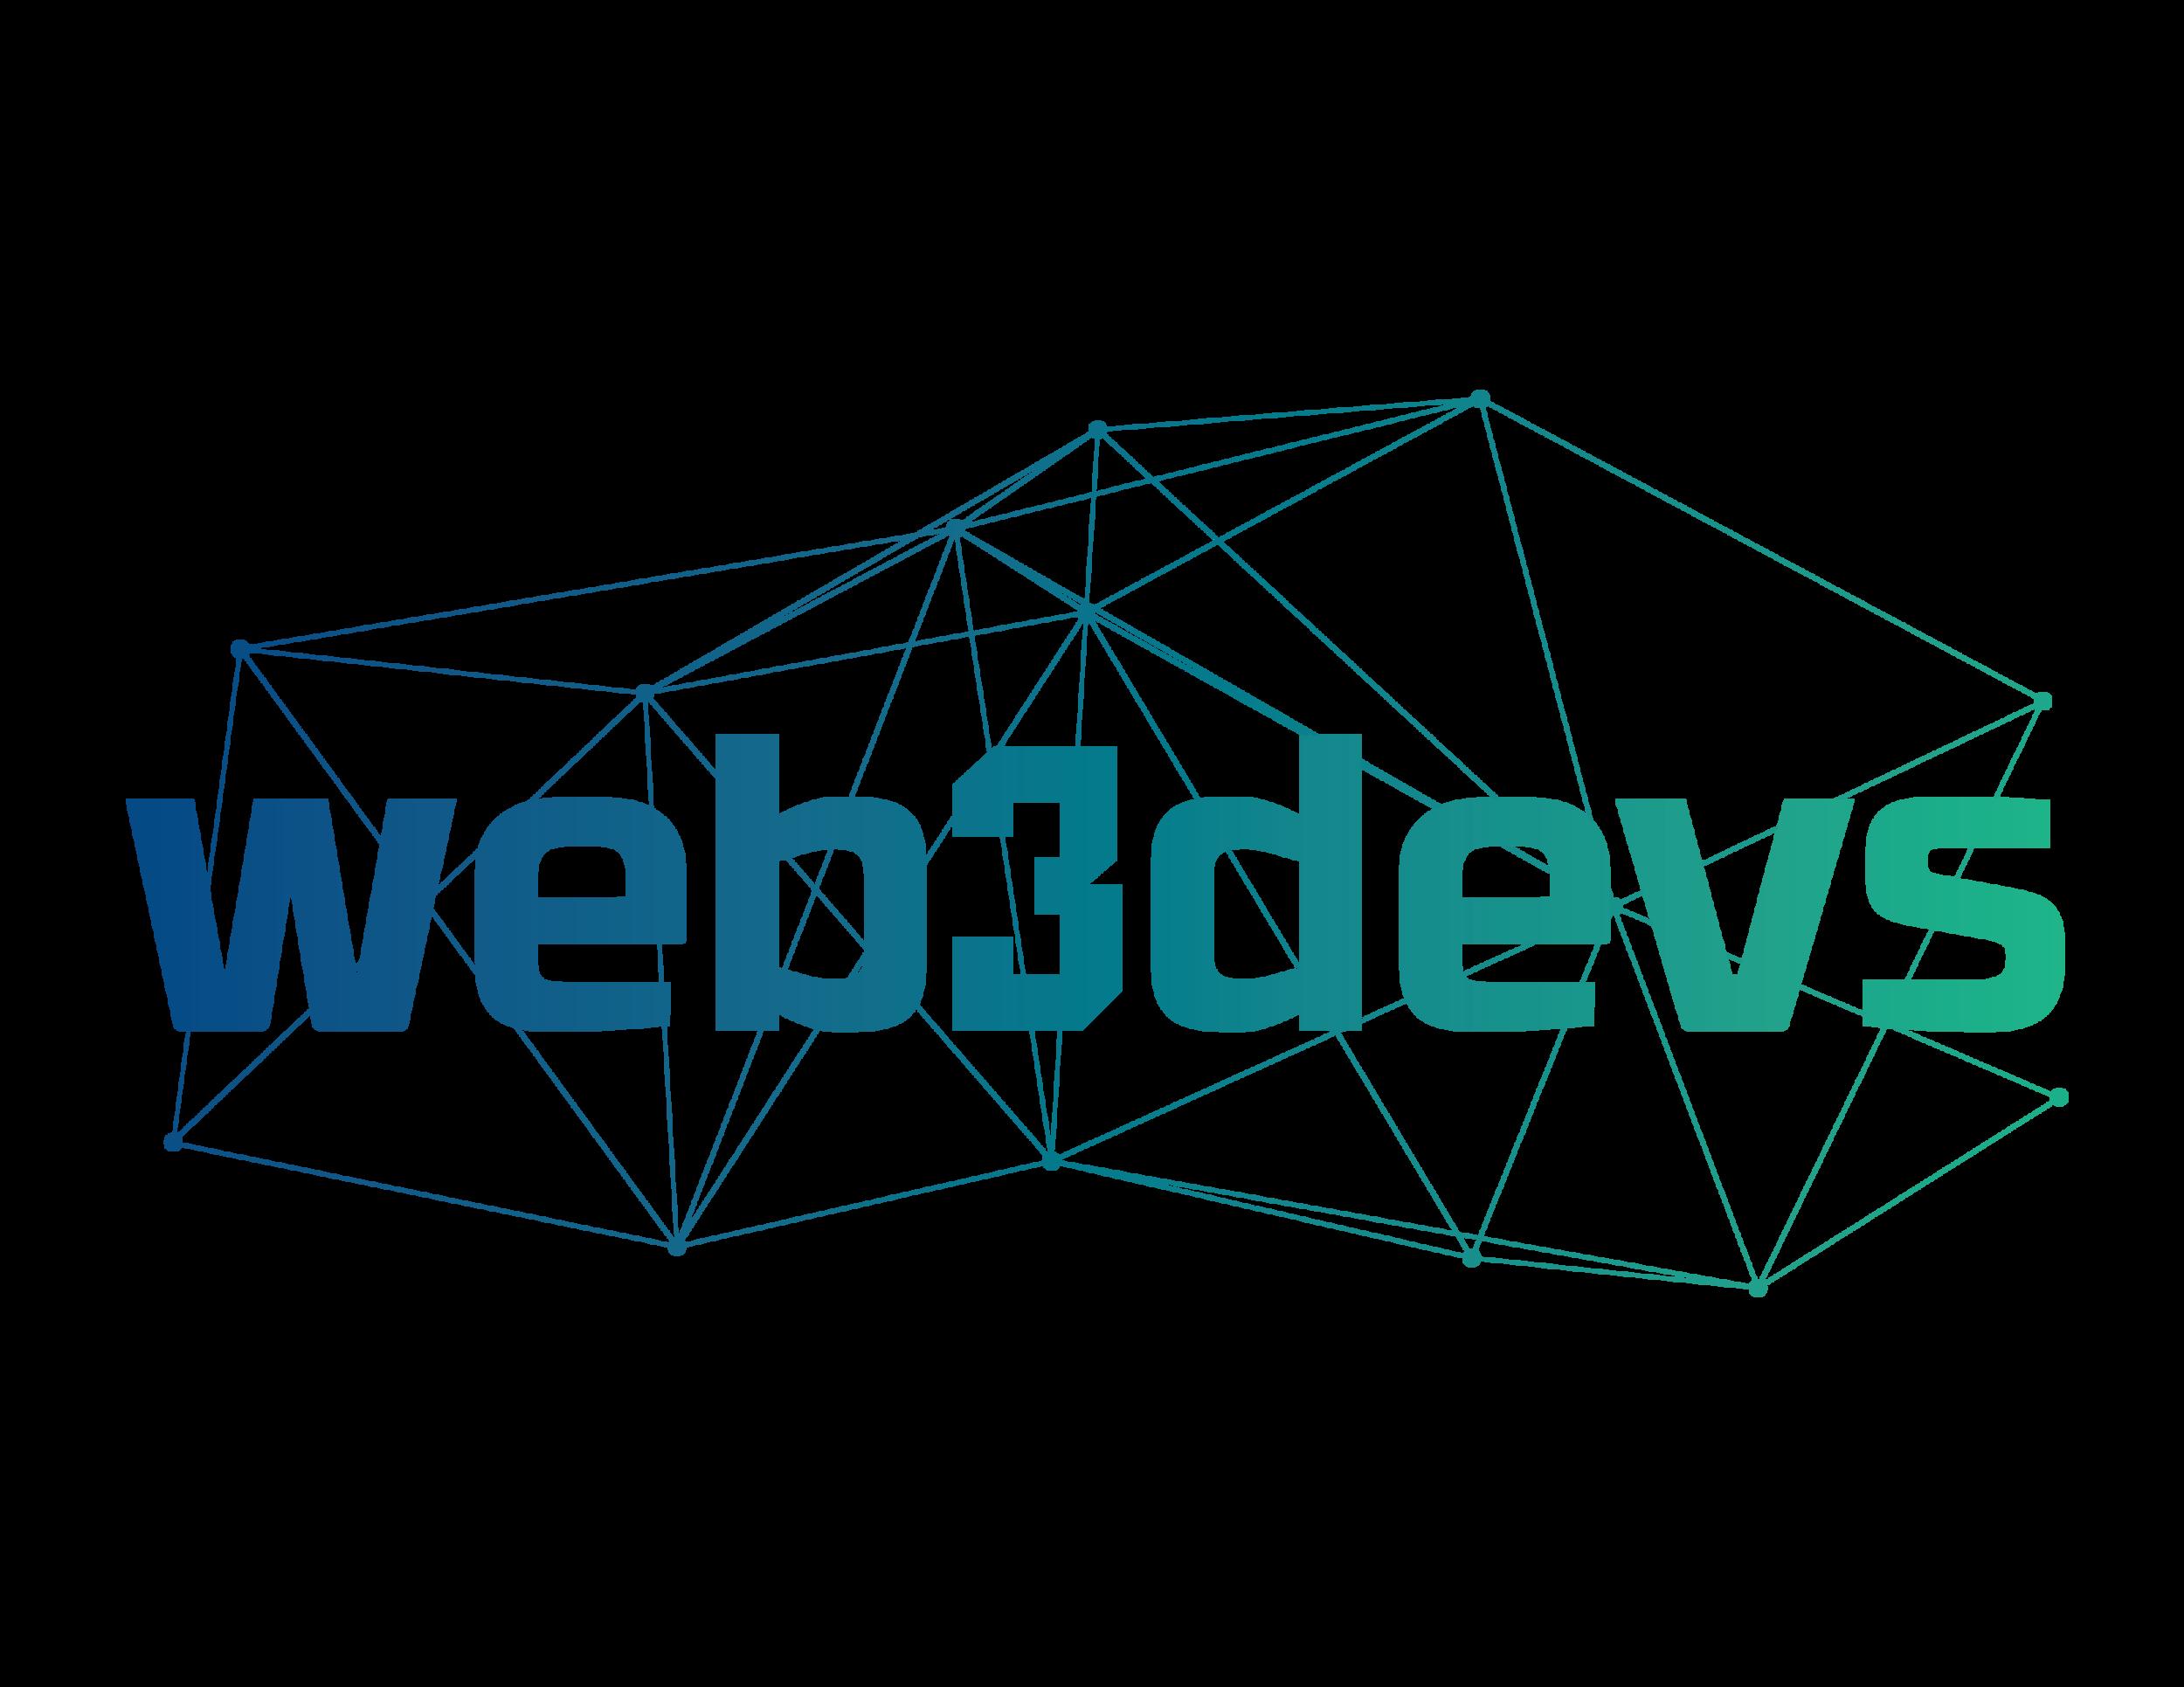 web3_logo401 (2).png